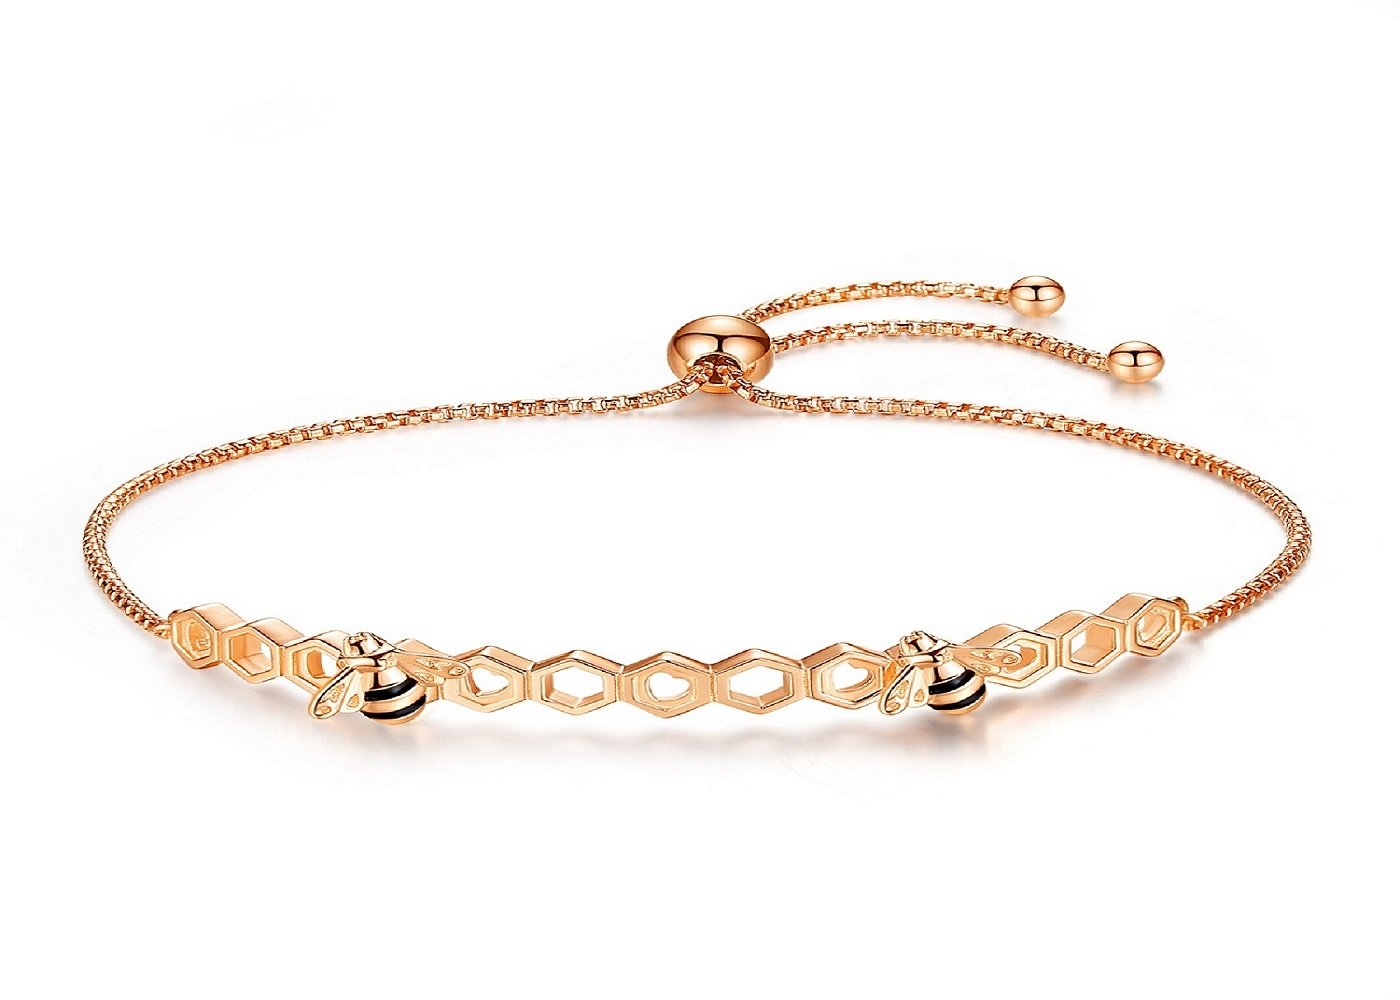 Presentski Honey bee Honeycomb Bracelet 925 Sterling Silver, Rose Gold Plated Adjustable Chain, Gift for Women